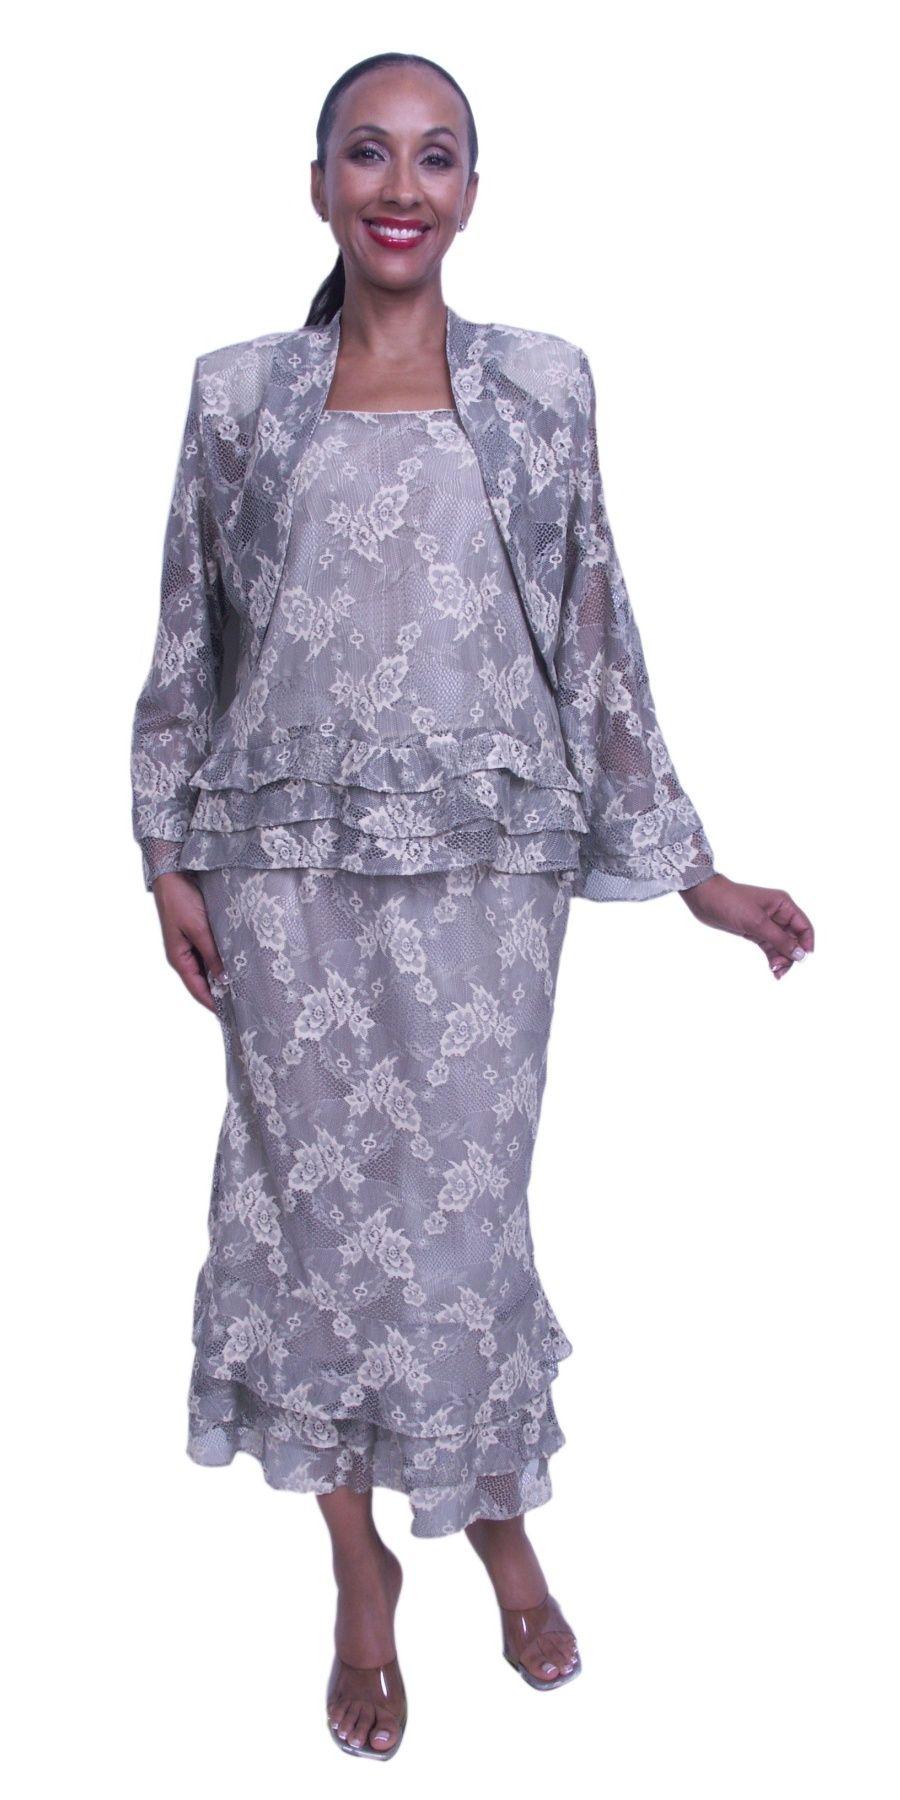 3 Piece Semi Formal Lace Dress Includes Jacket Top Skirt Plus Size